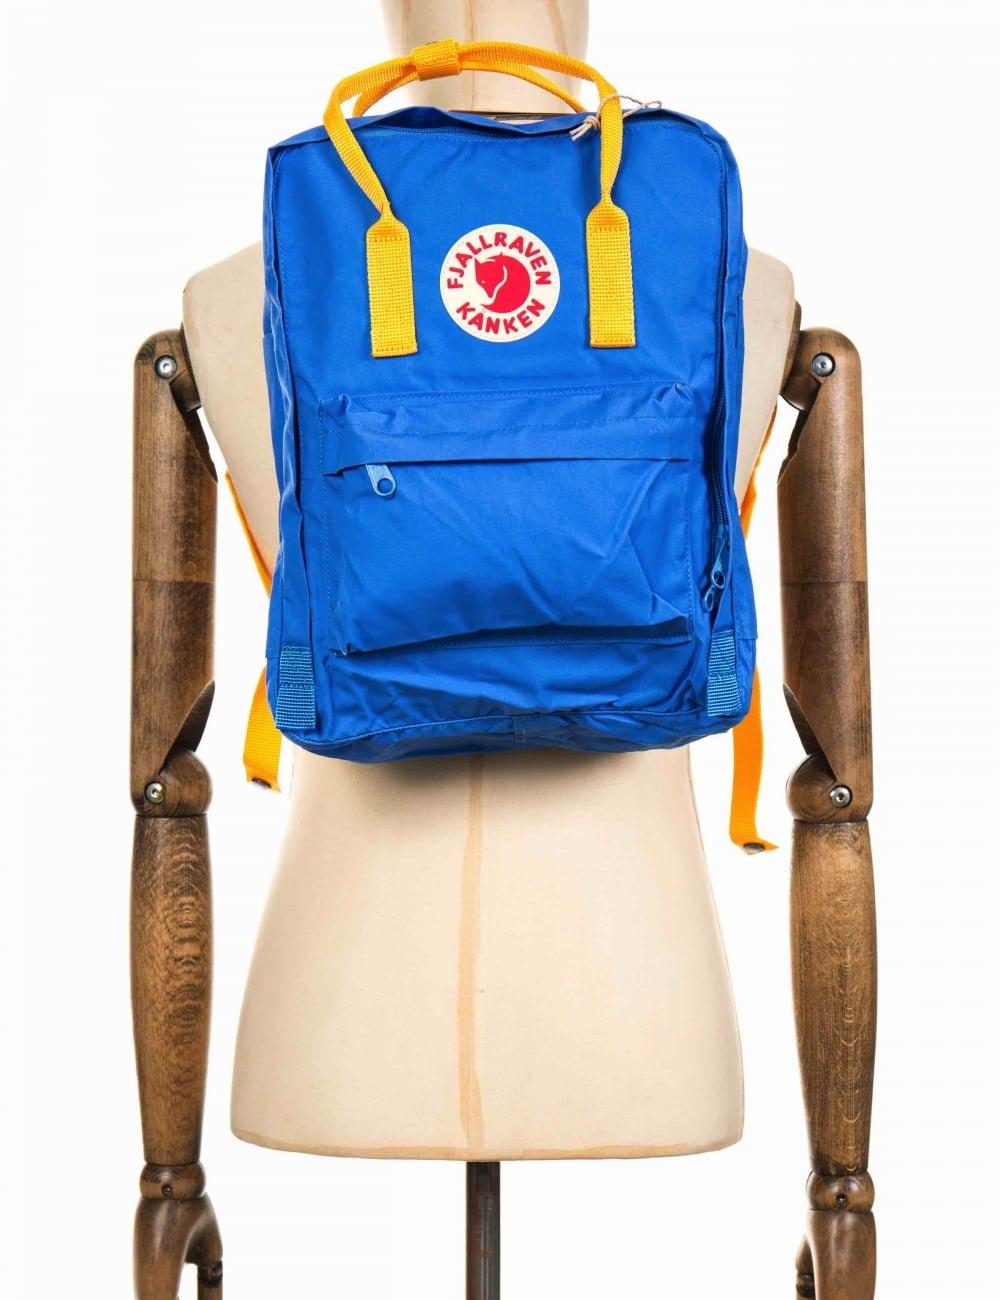 f66a7df89 Fjallraven Kanken Classic Backpack - UN Blue-Warm Yellow ...